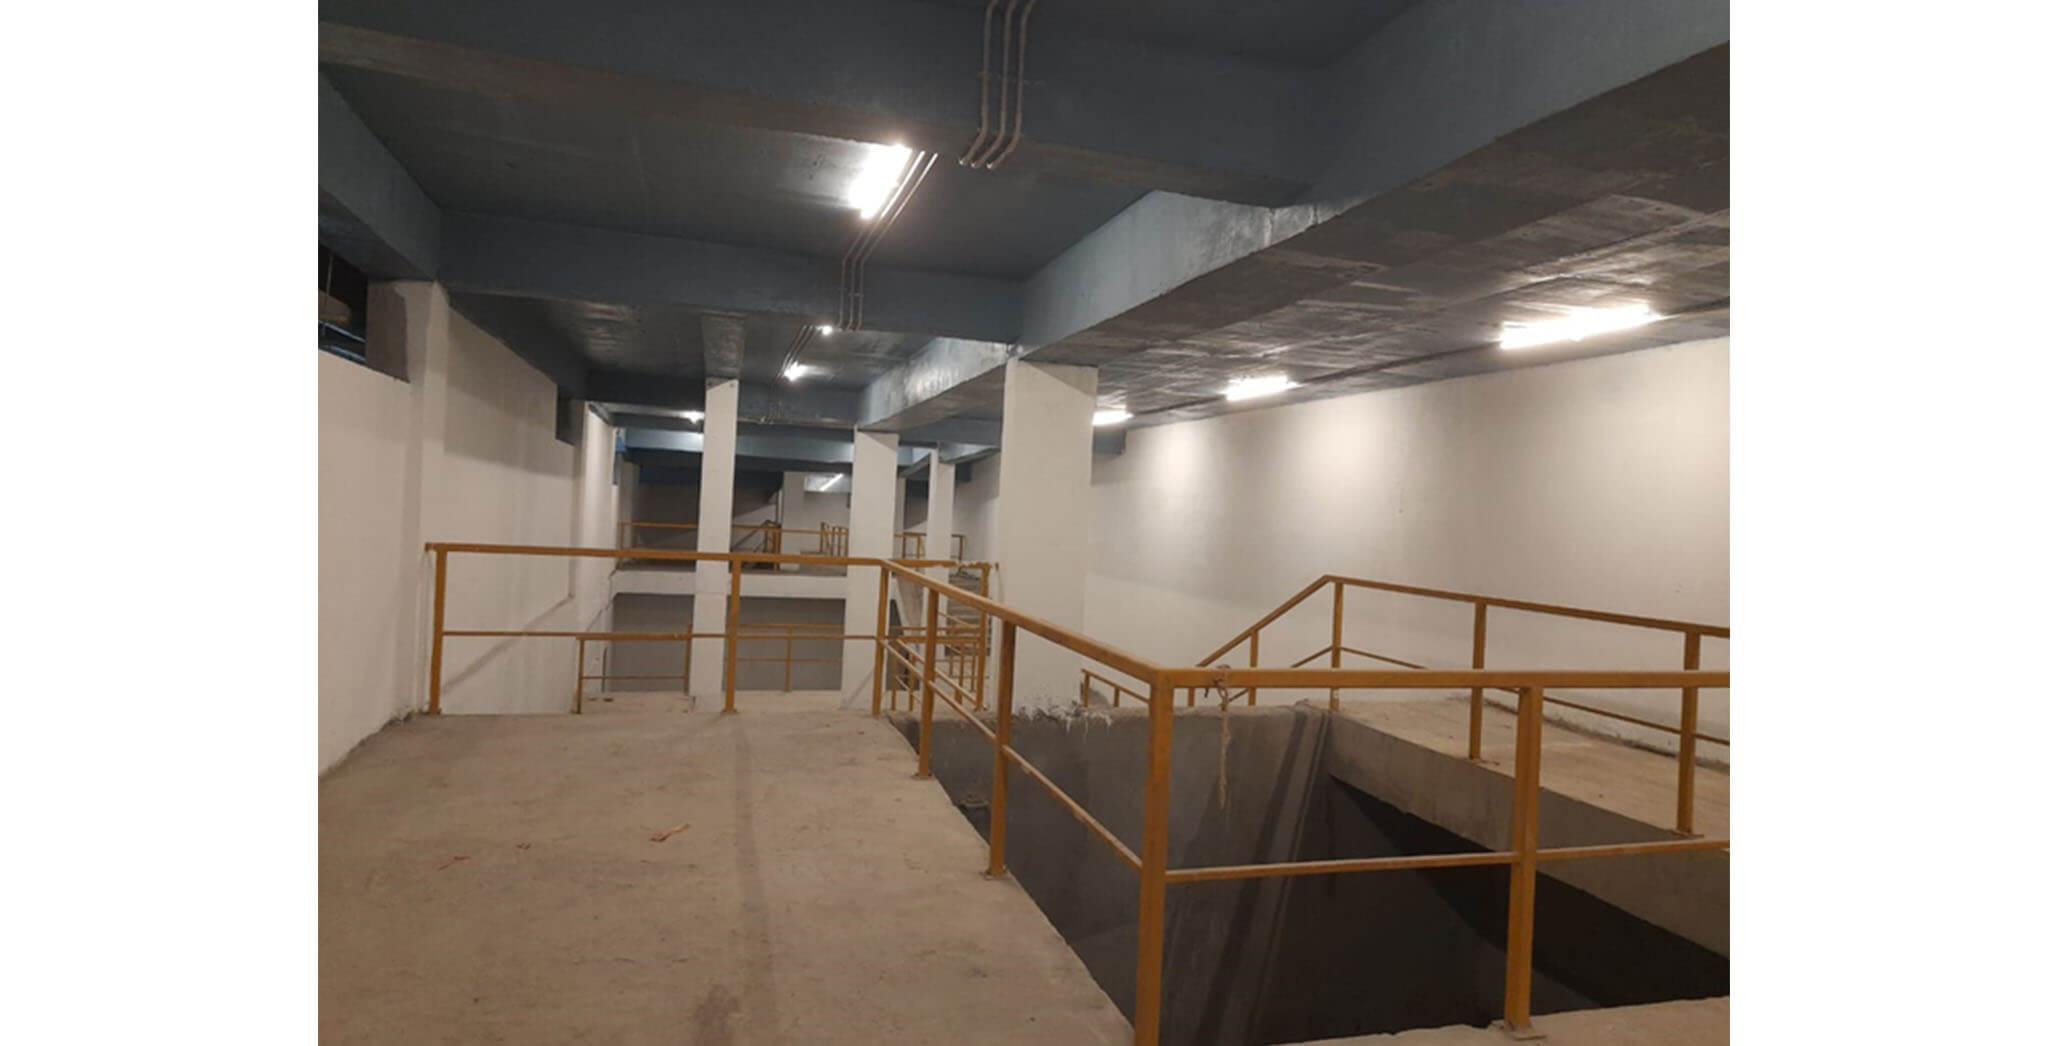 May 2021 - STP work-in-progress